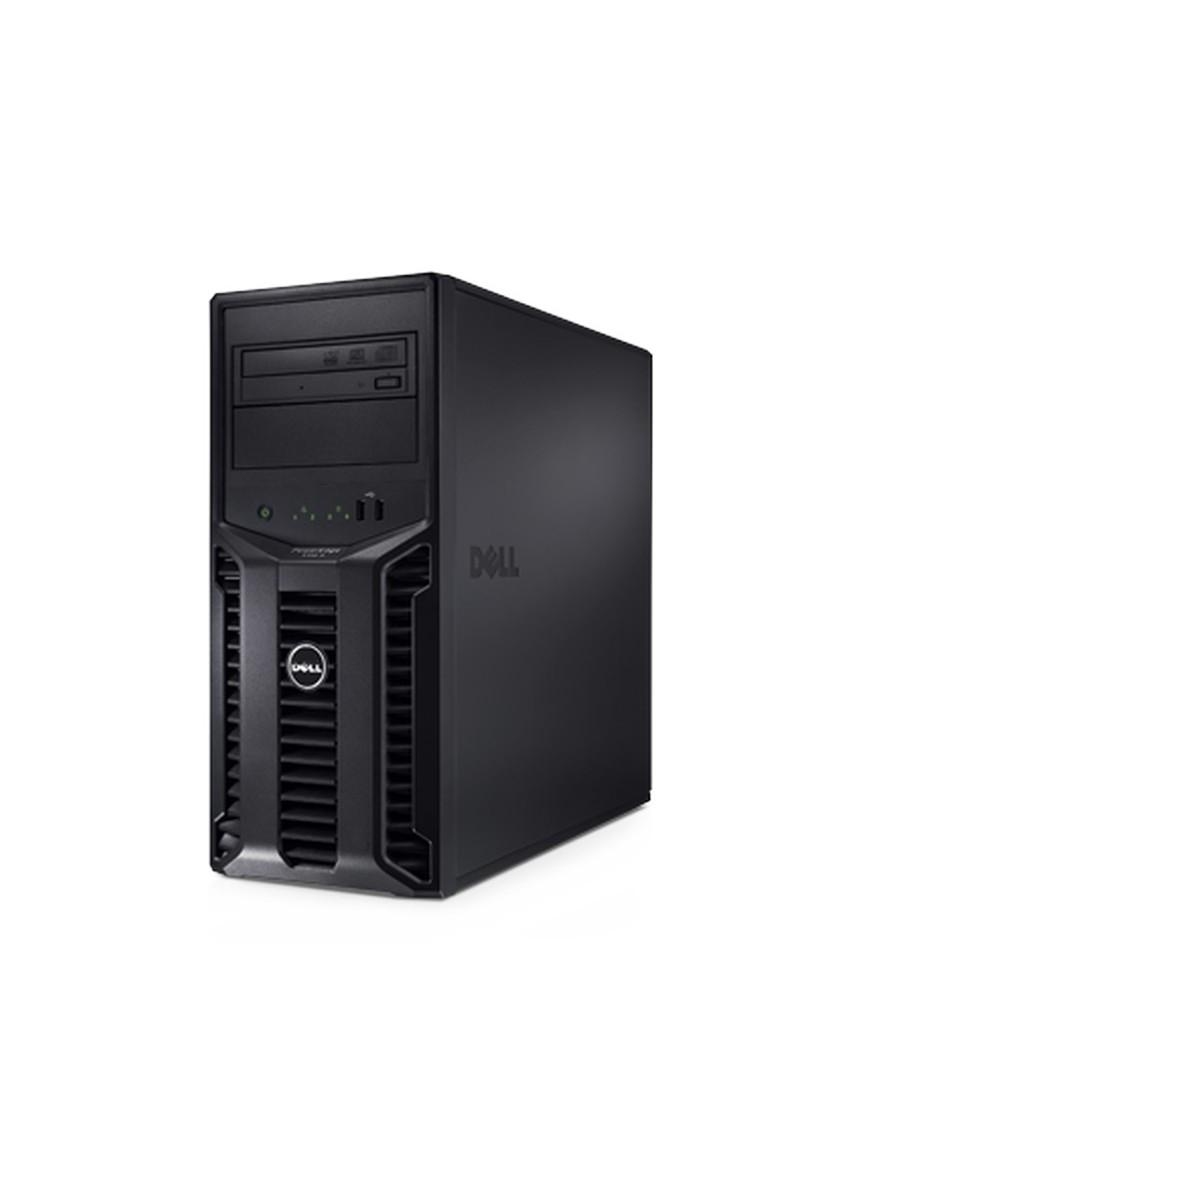 HP BL460c G6 Blade Server 2x2,26 QC L5520/8GB/P410